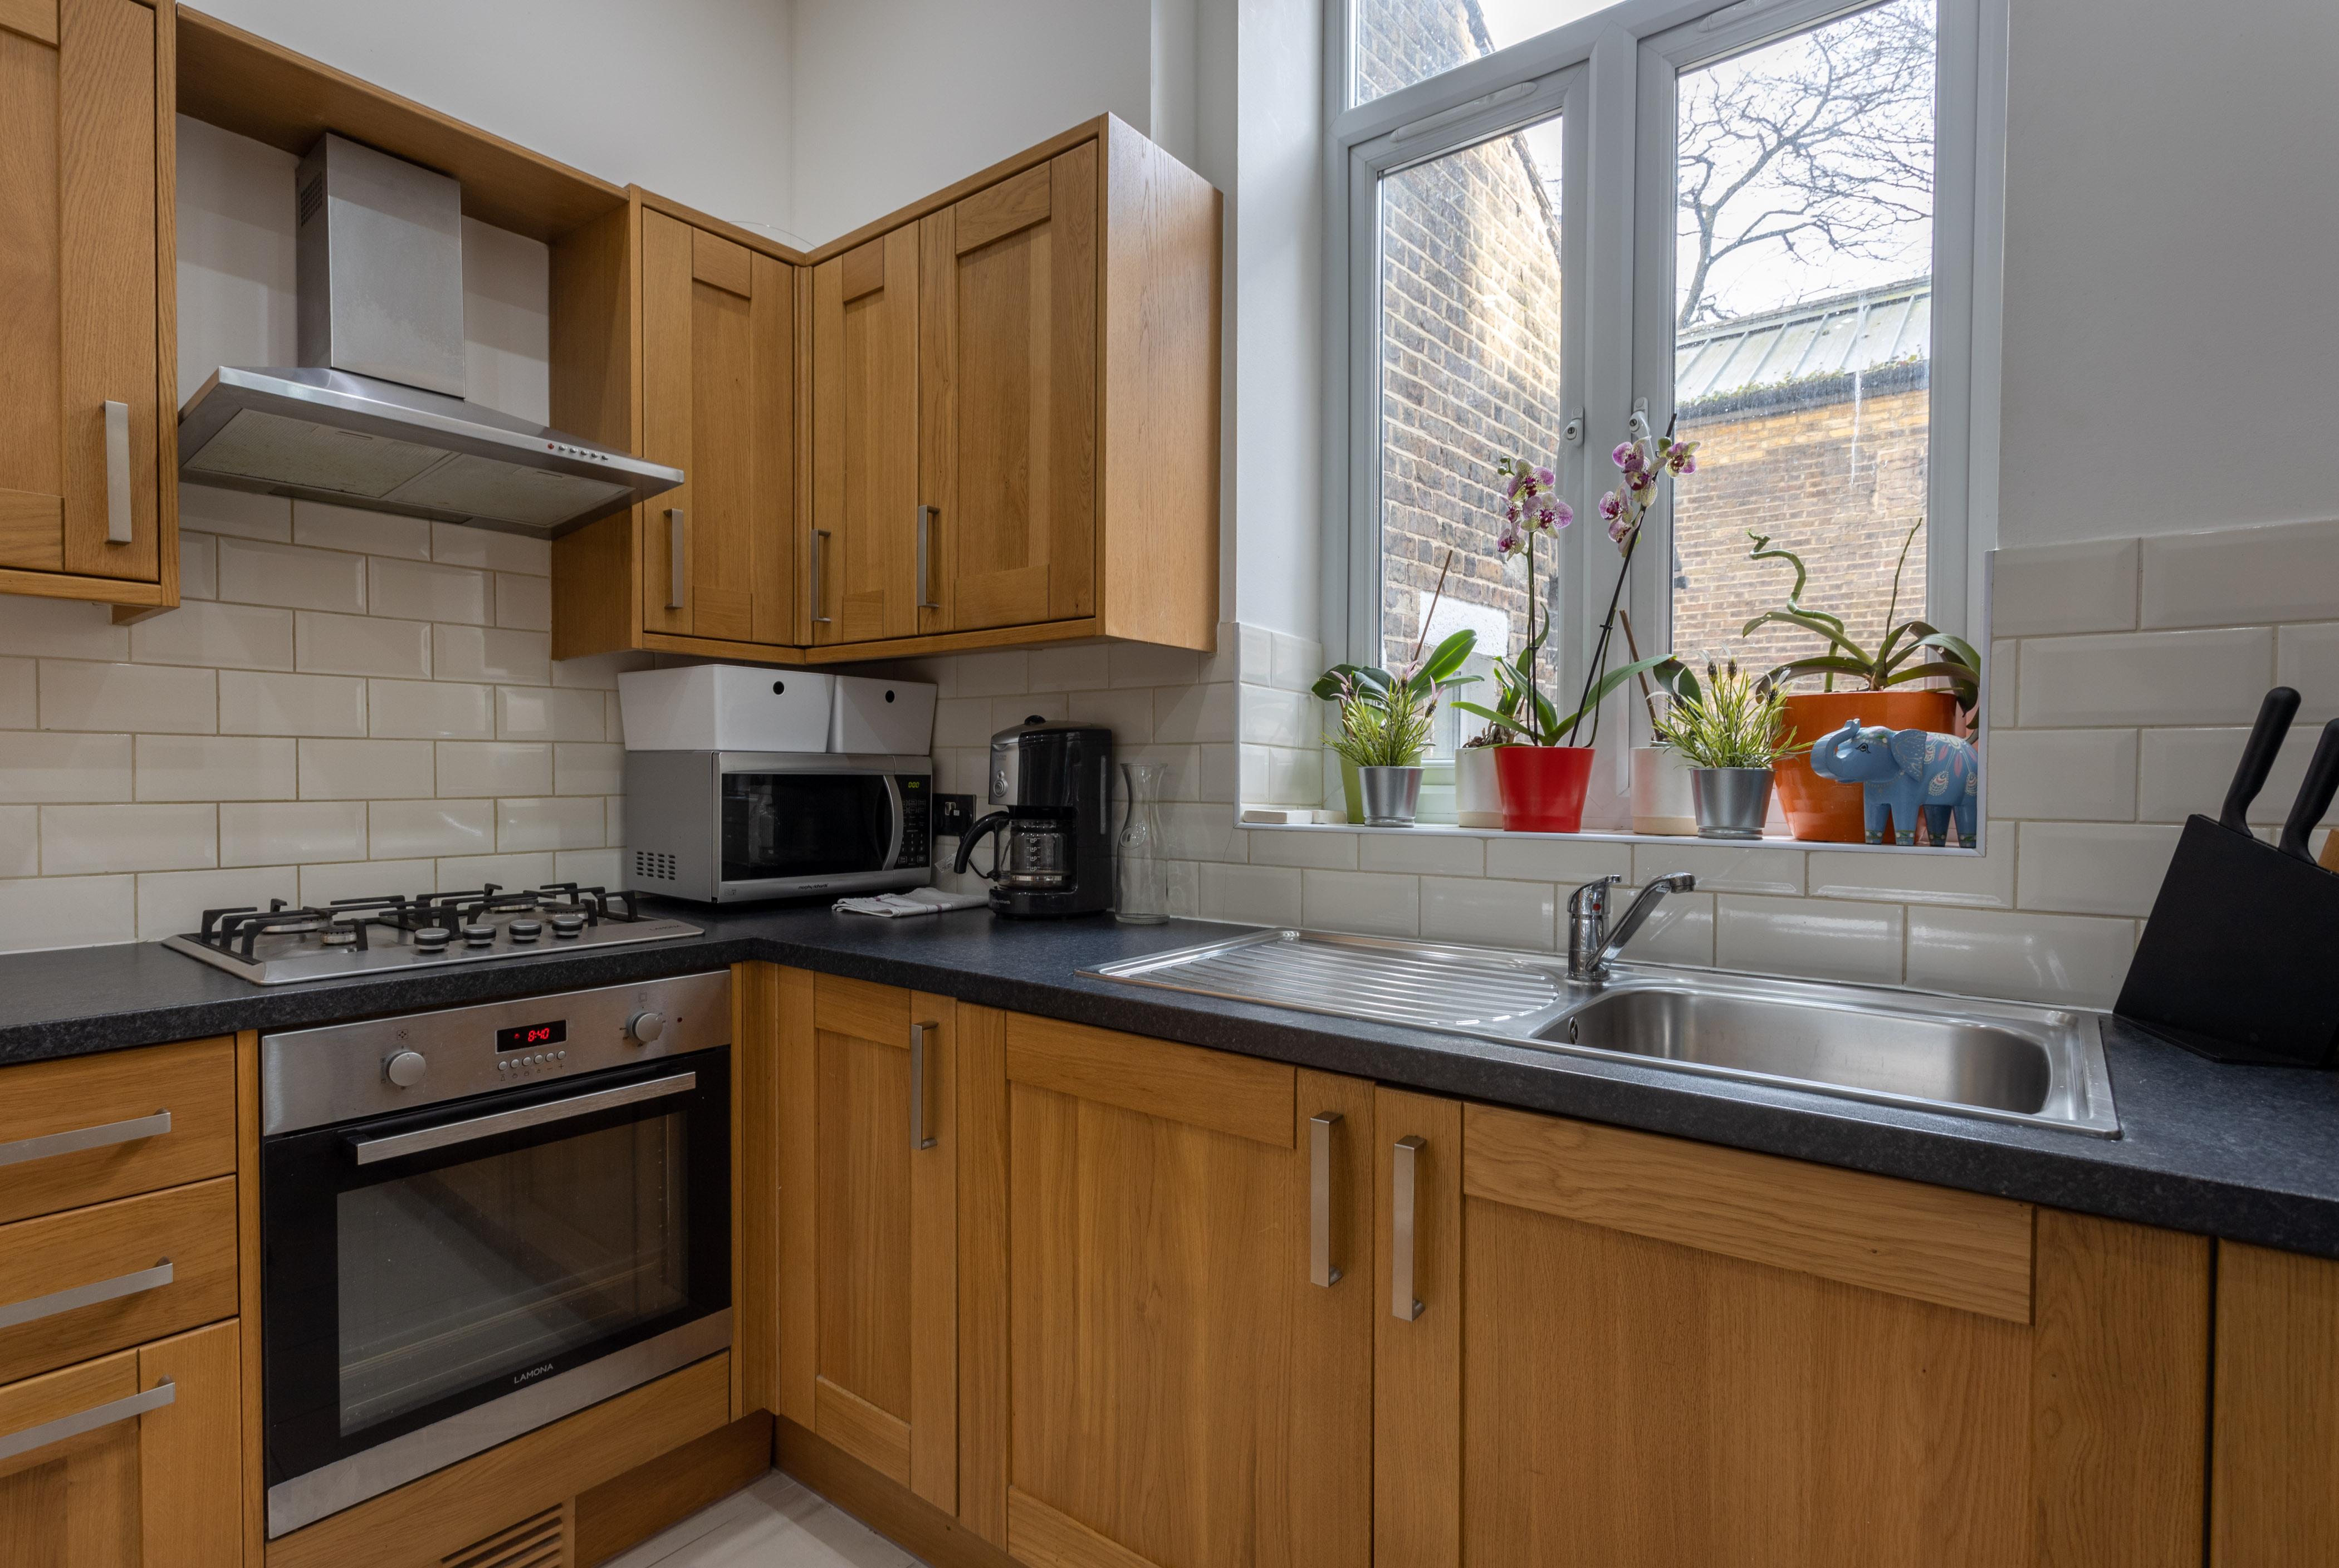 Apartment King s Cross Eurostar Double Room - Shared Bathroom - Shared Kitchen  ROOM 4  photo 26059385